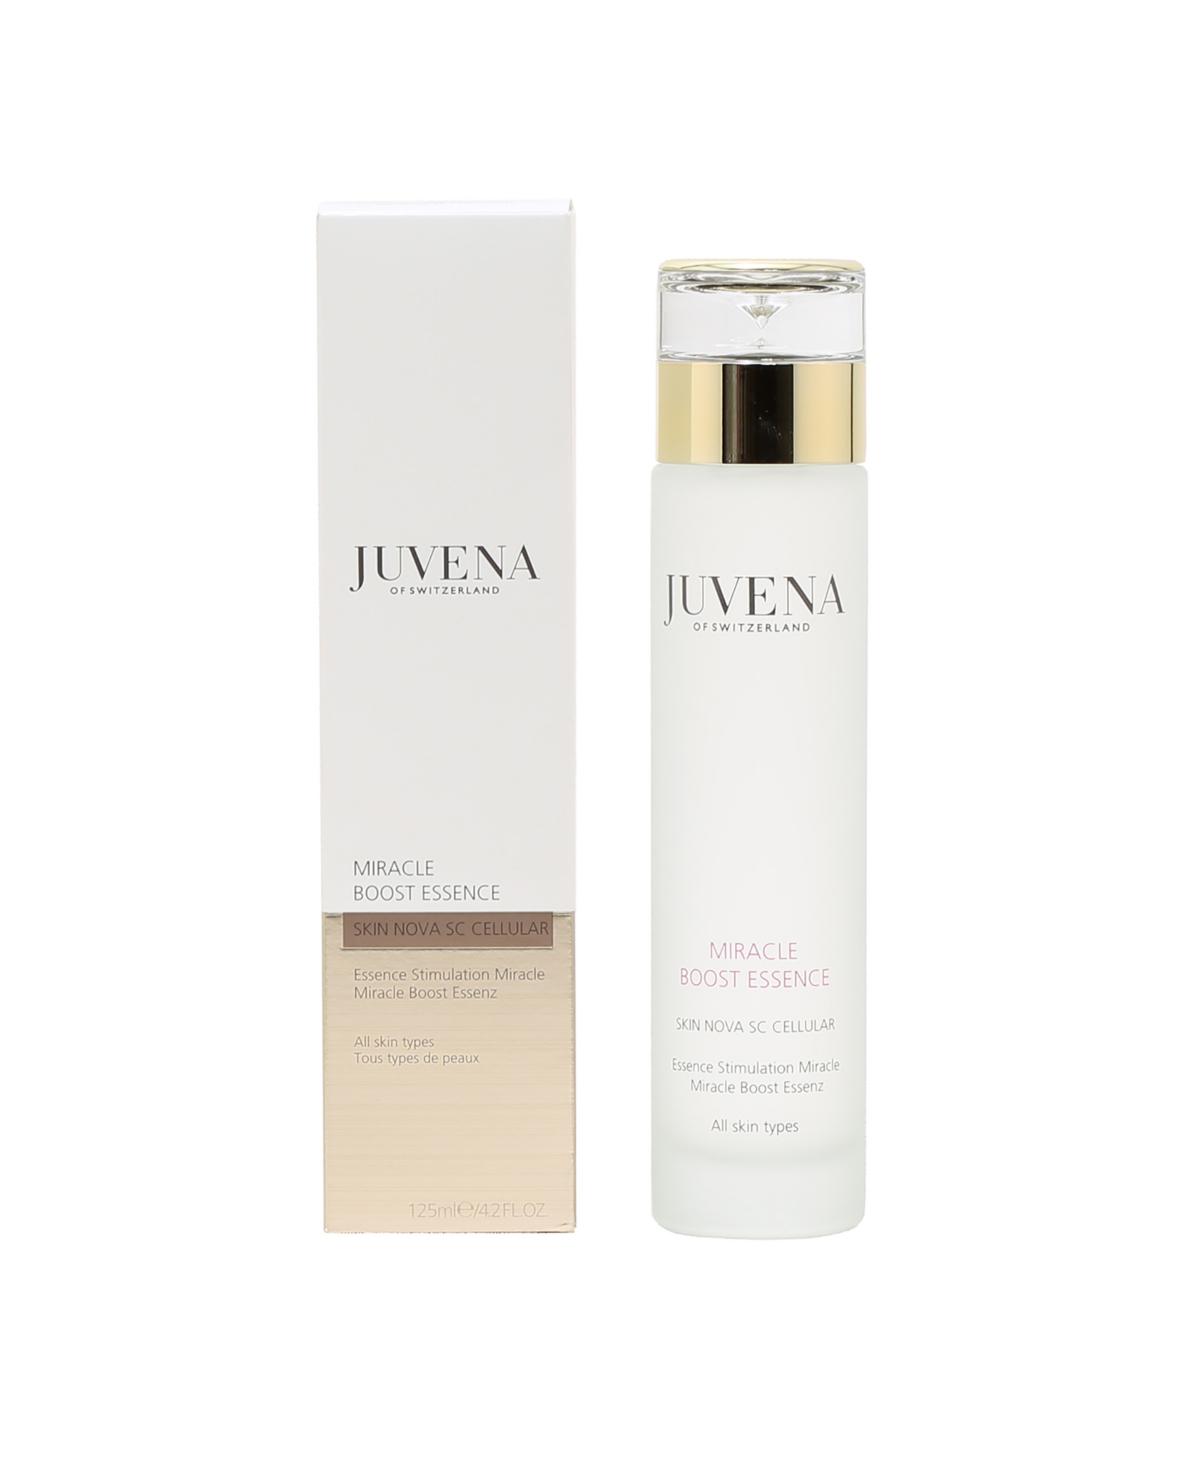 Juvena Miracle Boost Essence, 4.2 oz